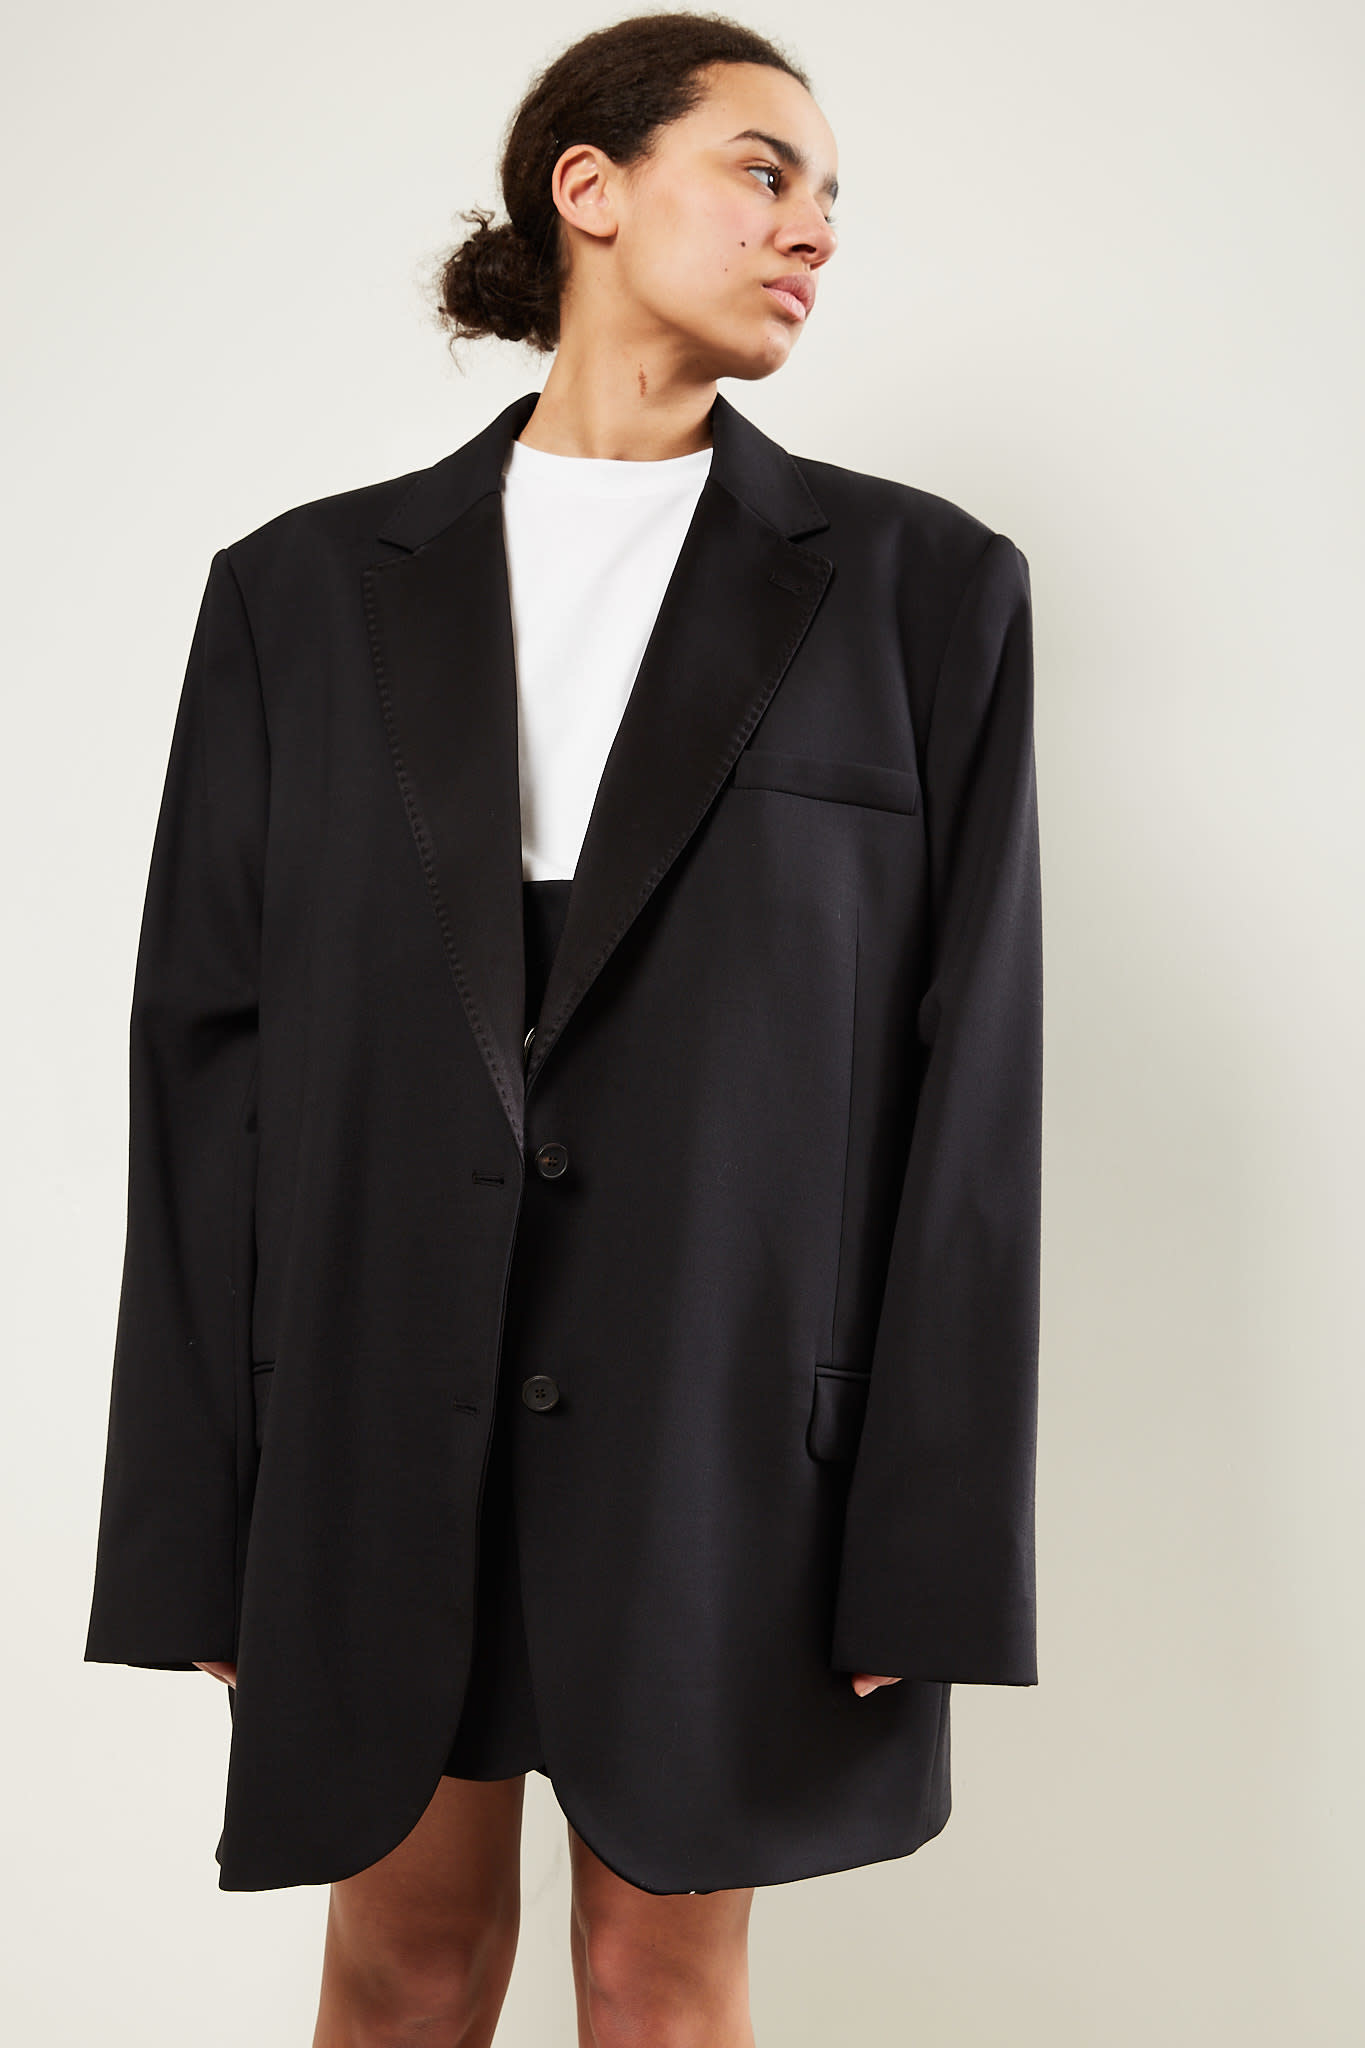 Frenken Tux jacket